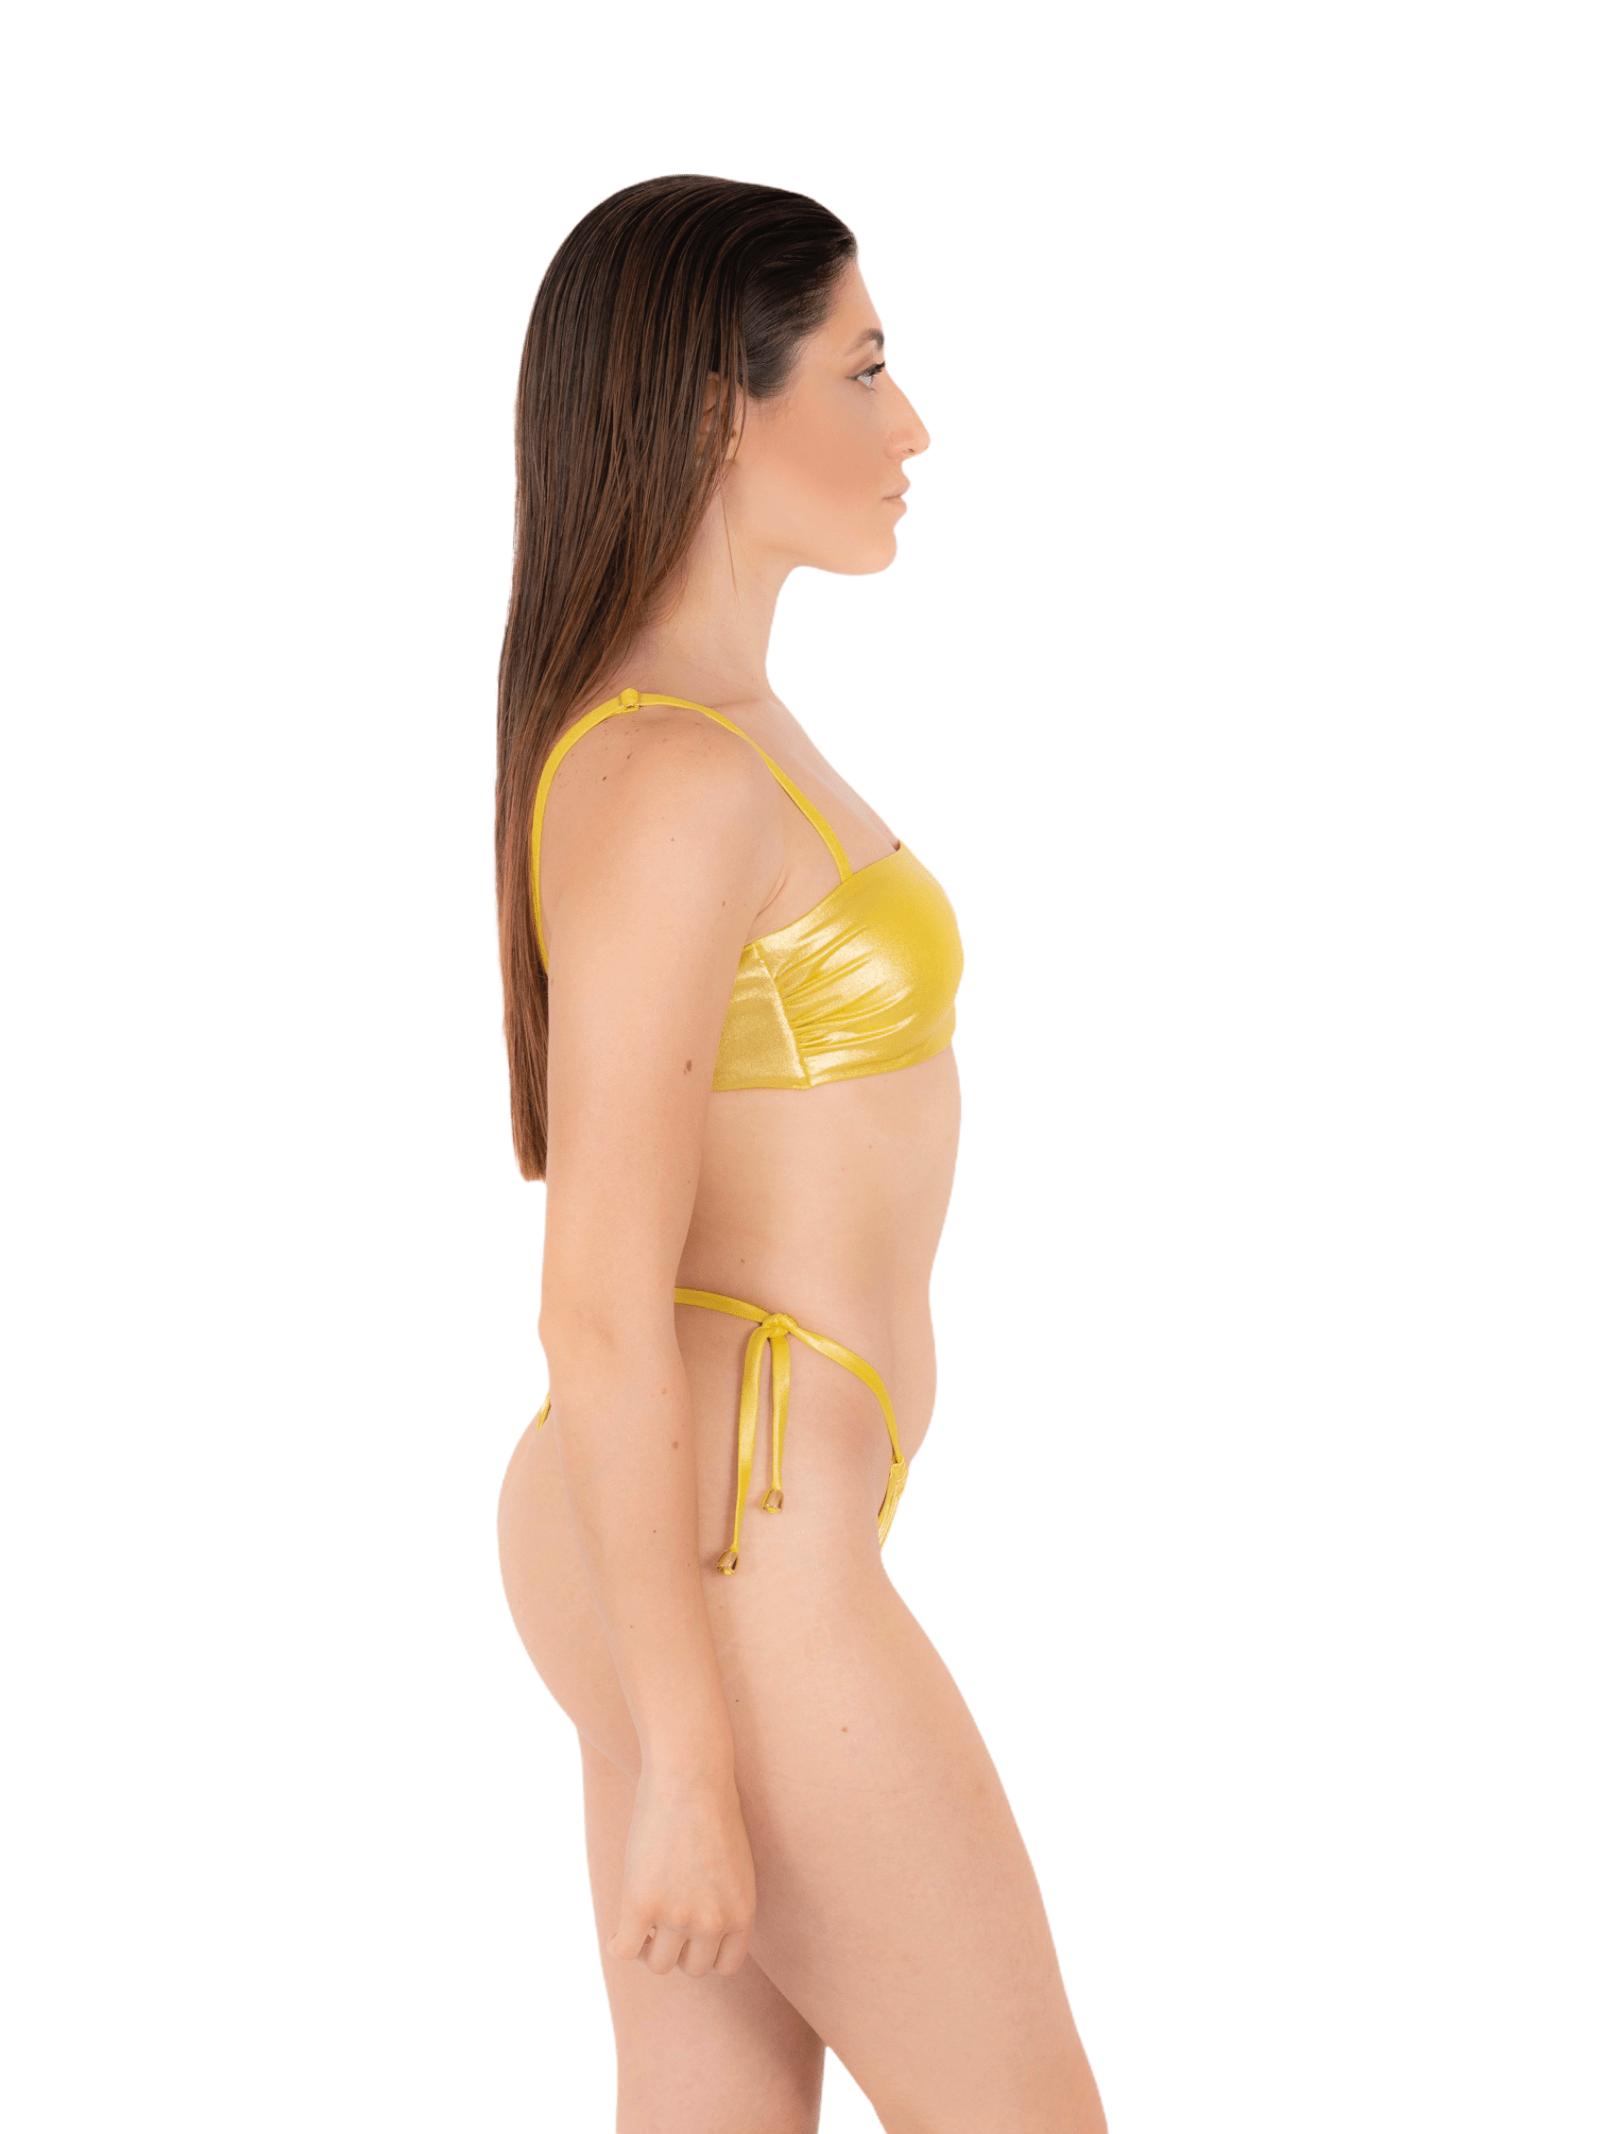 Bikini top with thong slip ANNAMARE | 23 | BK-129GIALLO